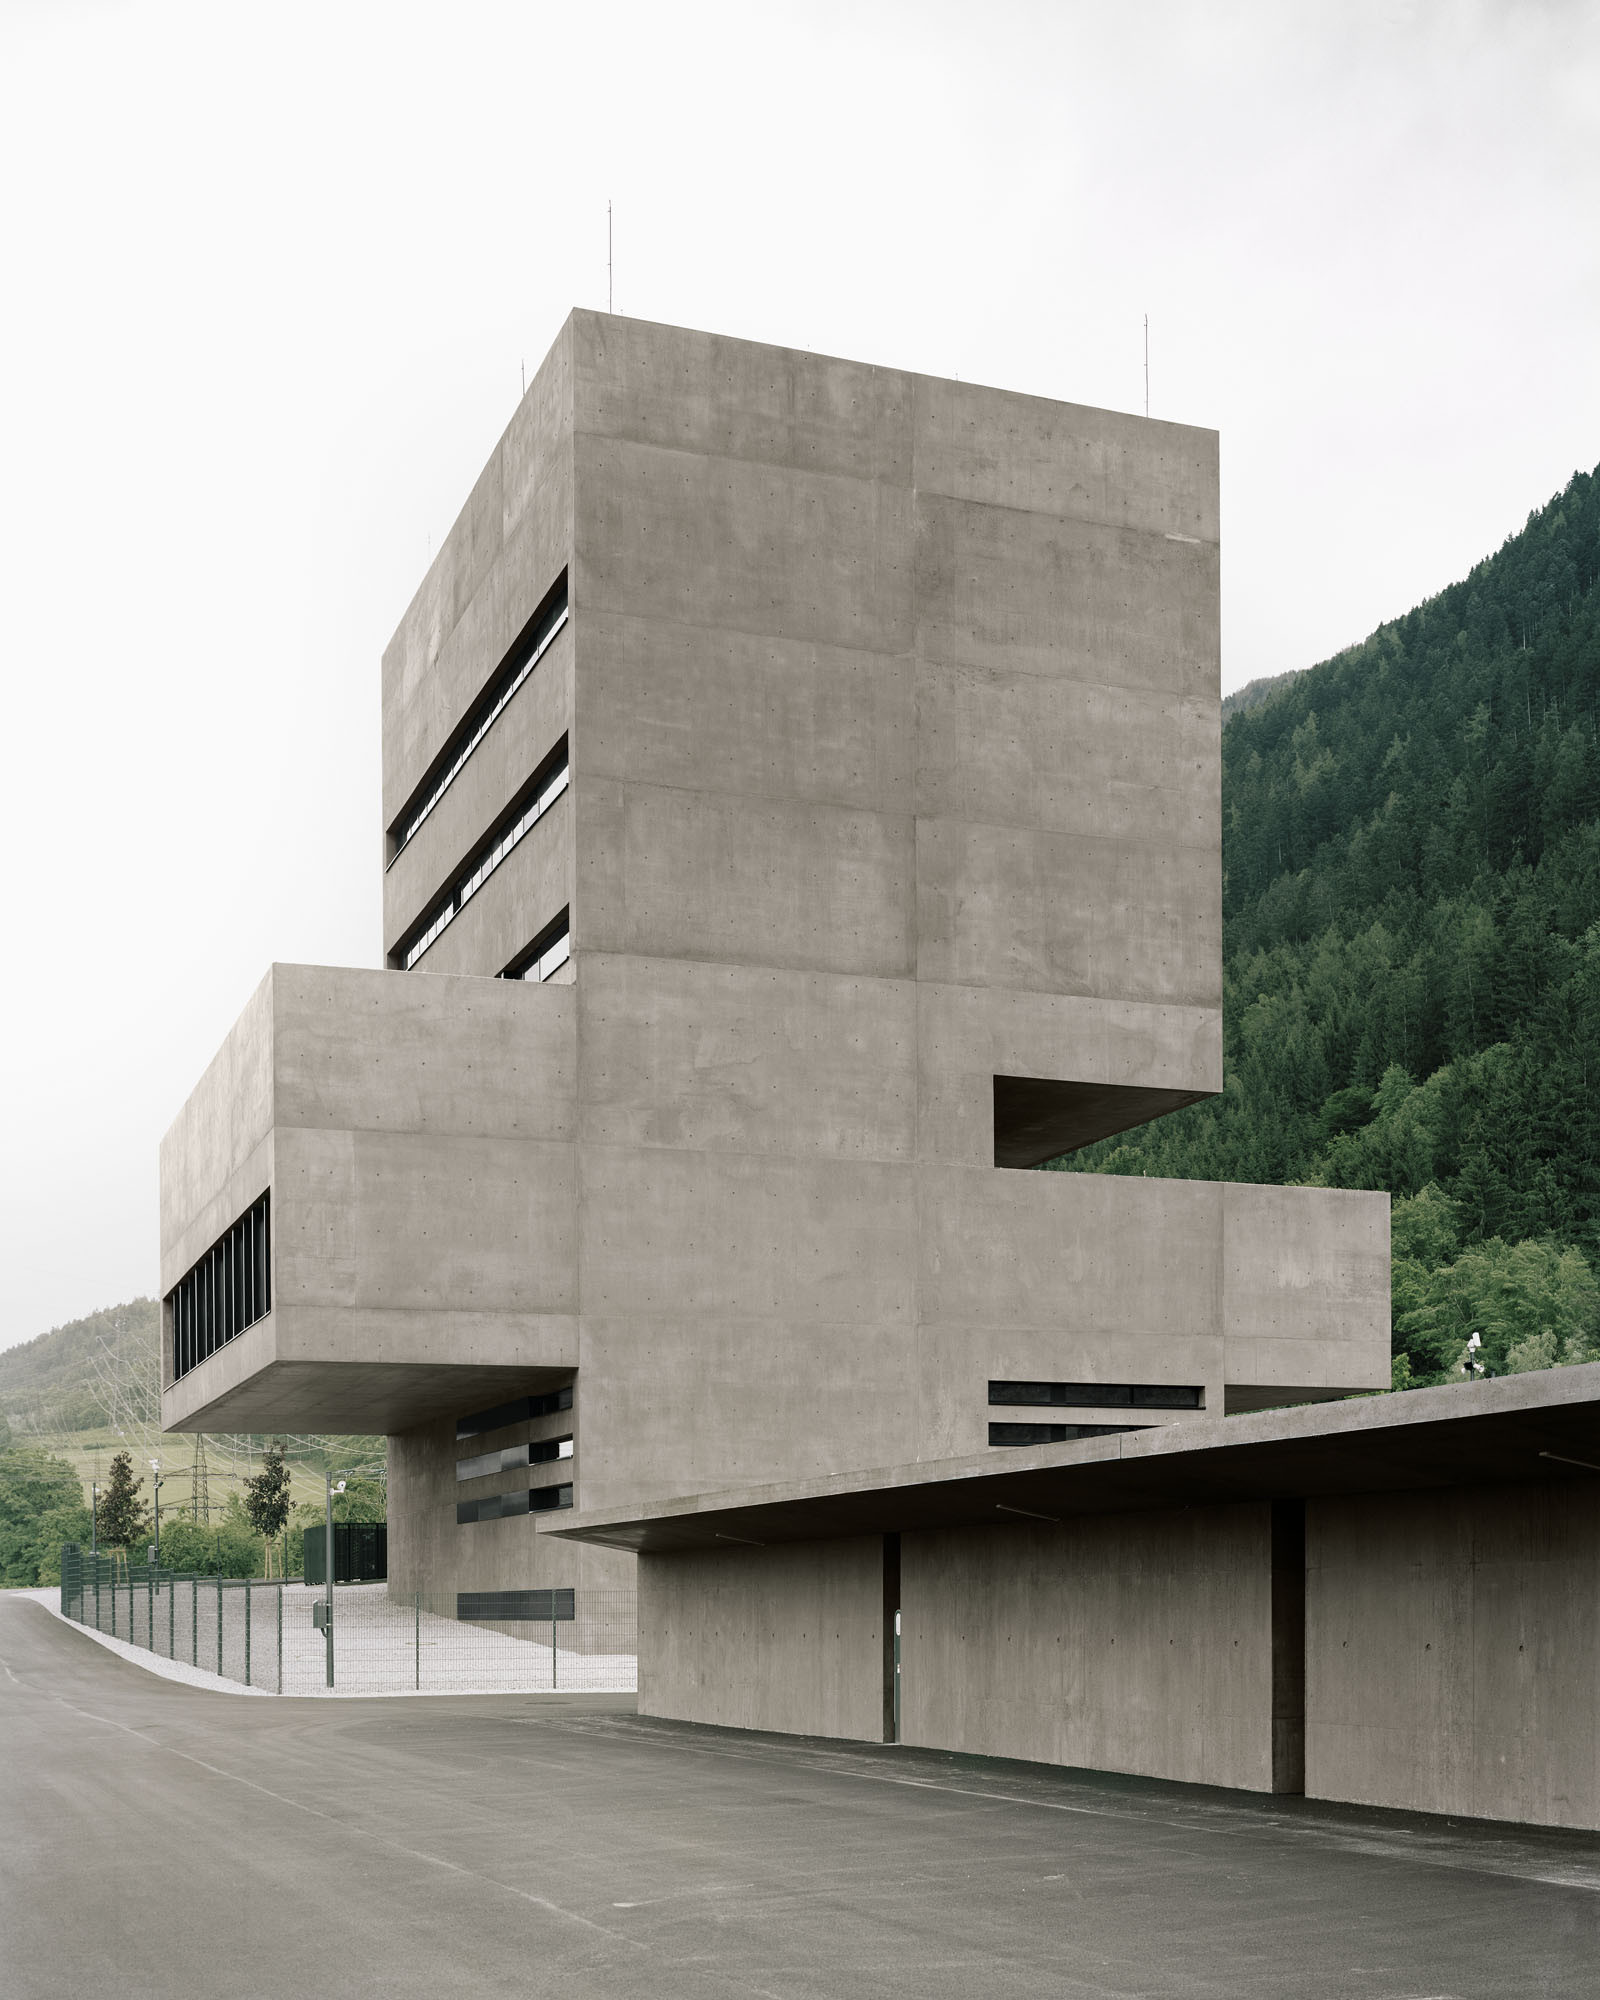 Centro de control de la central eléctrica Tiwag / Bechter Zaffignani ... - Plataforma Arquitectura